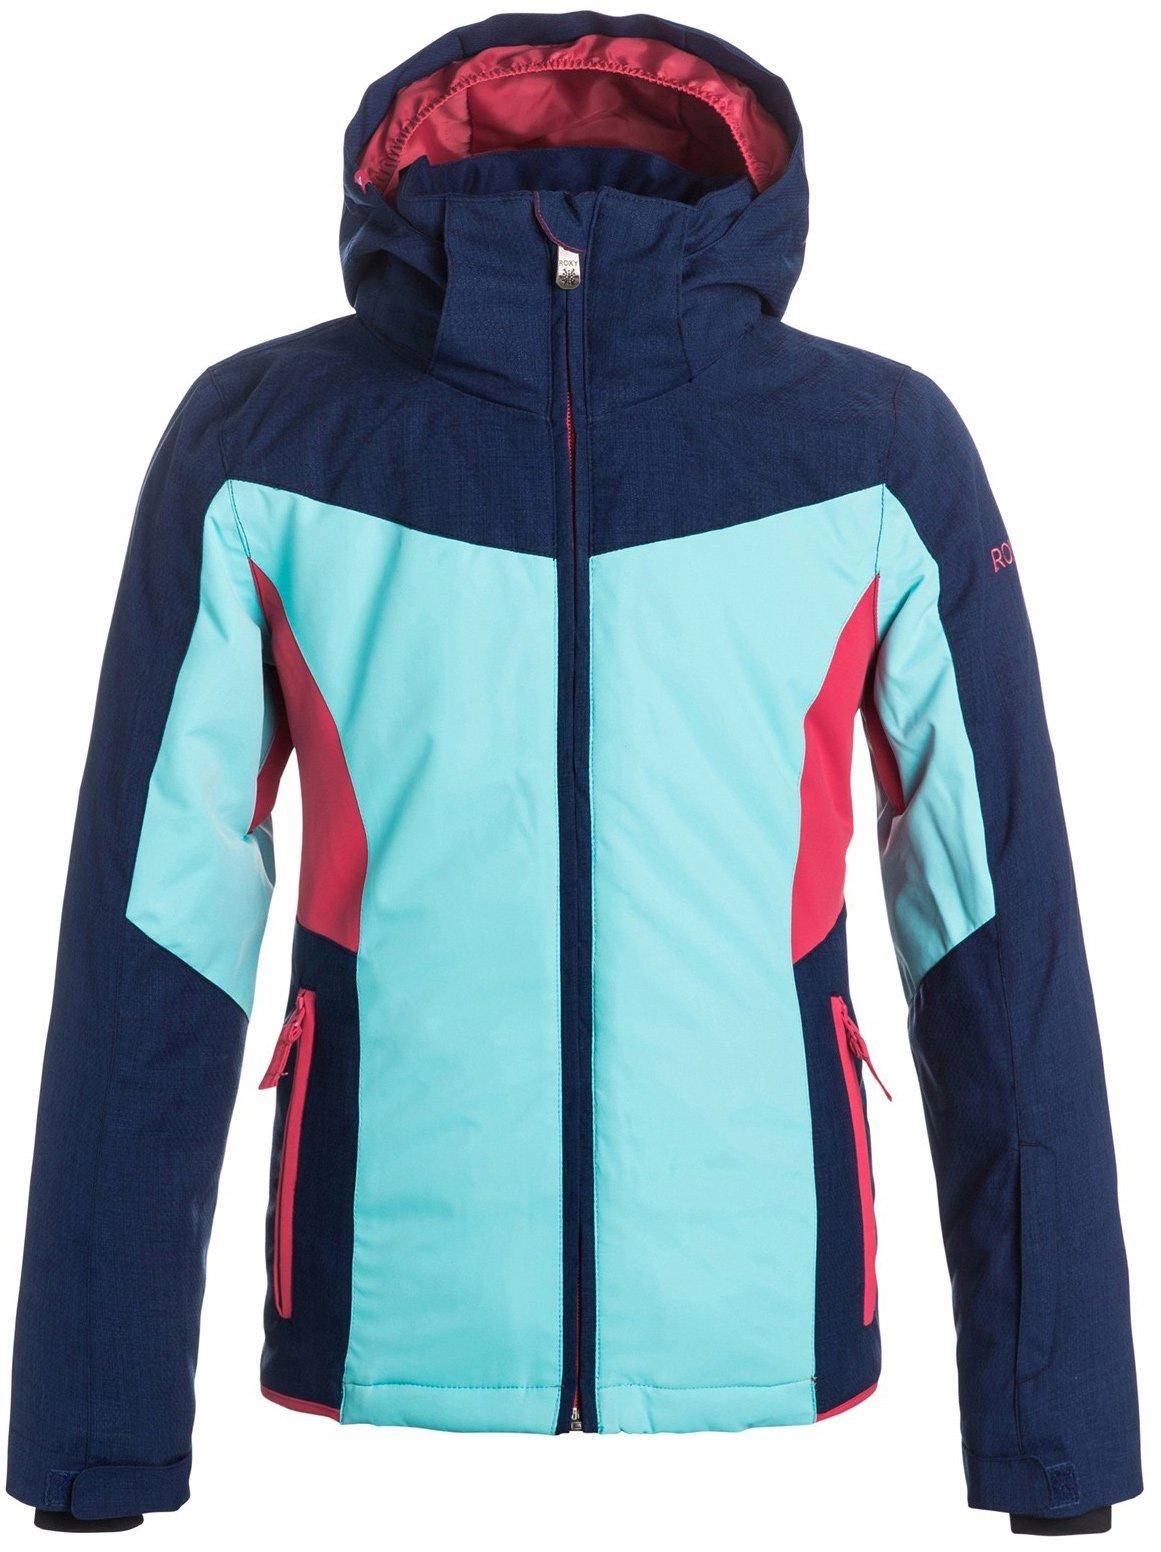 Roxy Big Girls' Sassy Snow Jacket, Blue Print, 8/S